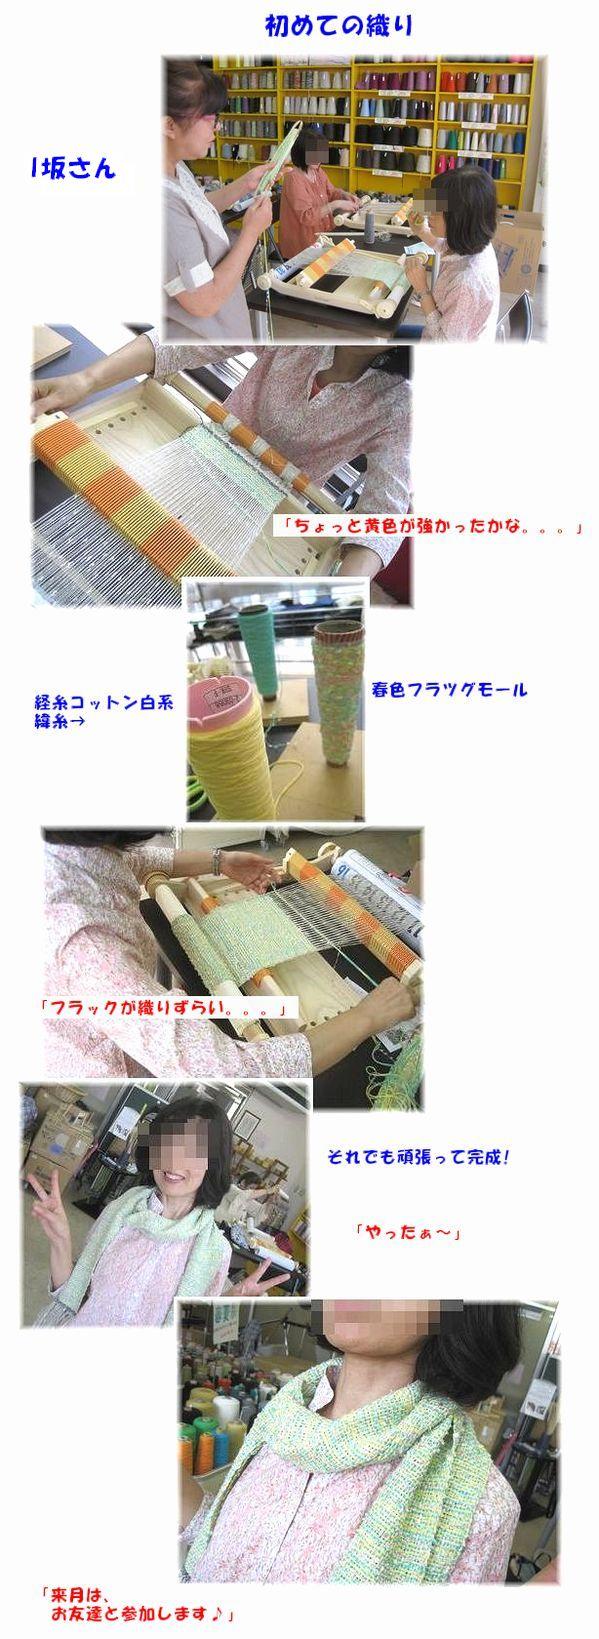 c0221884_23233626.jpg